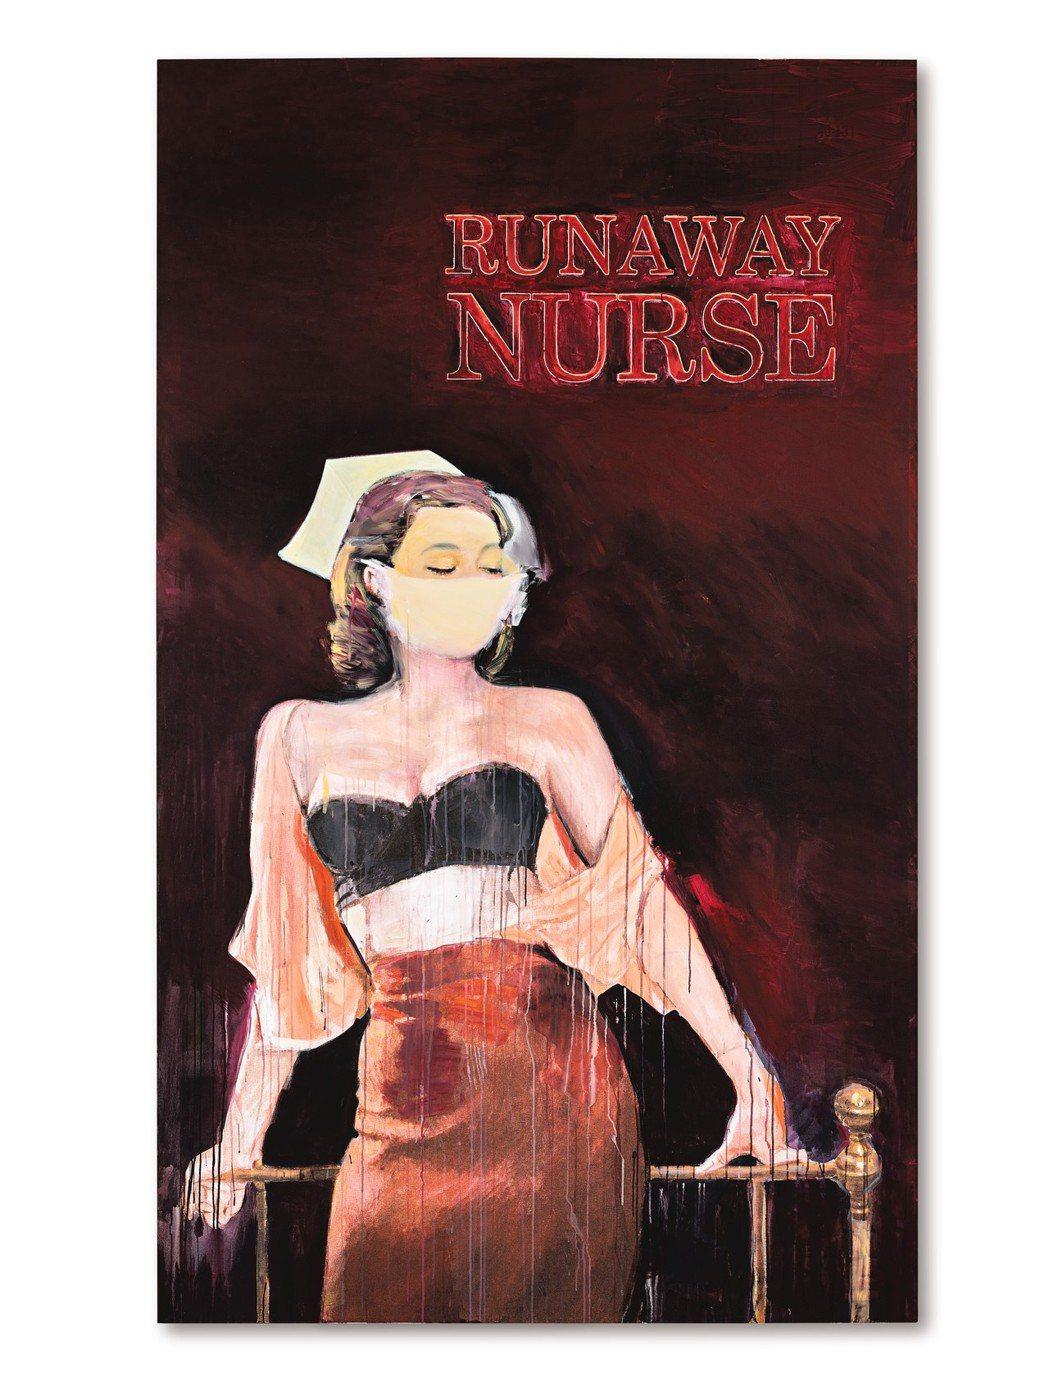 Richard Prince 2005至2006年作「逃脫的護士」,油墨及壓克力...